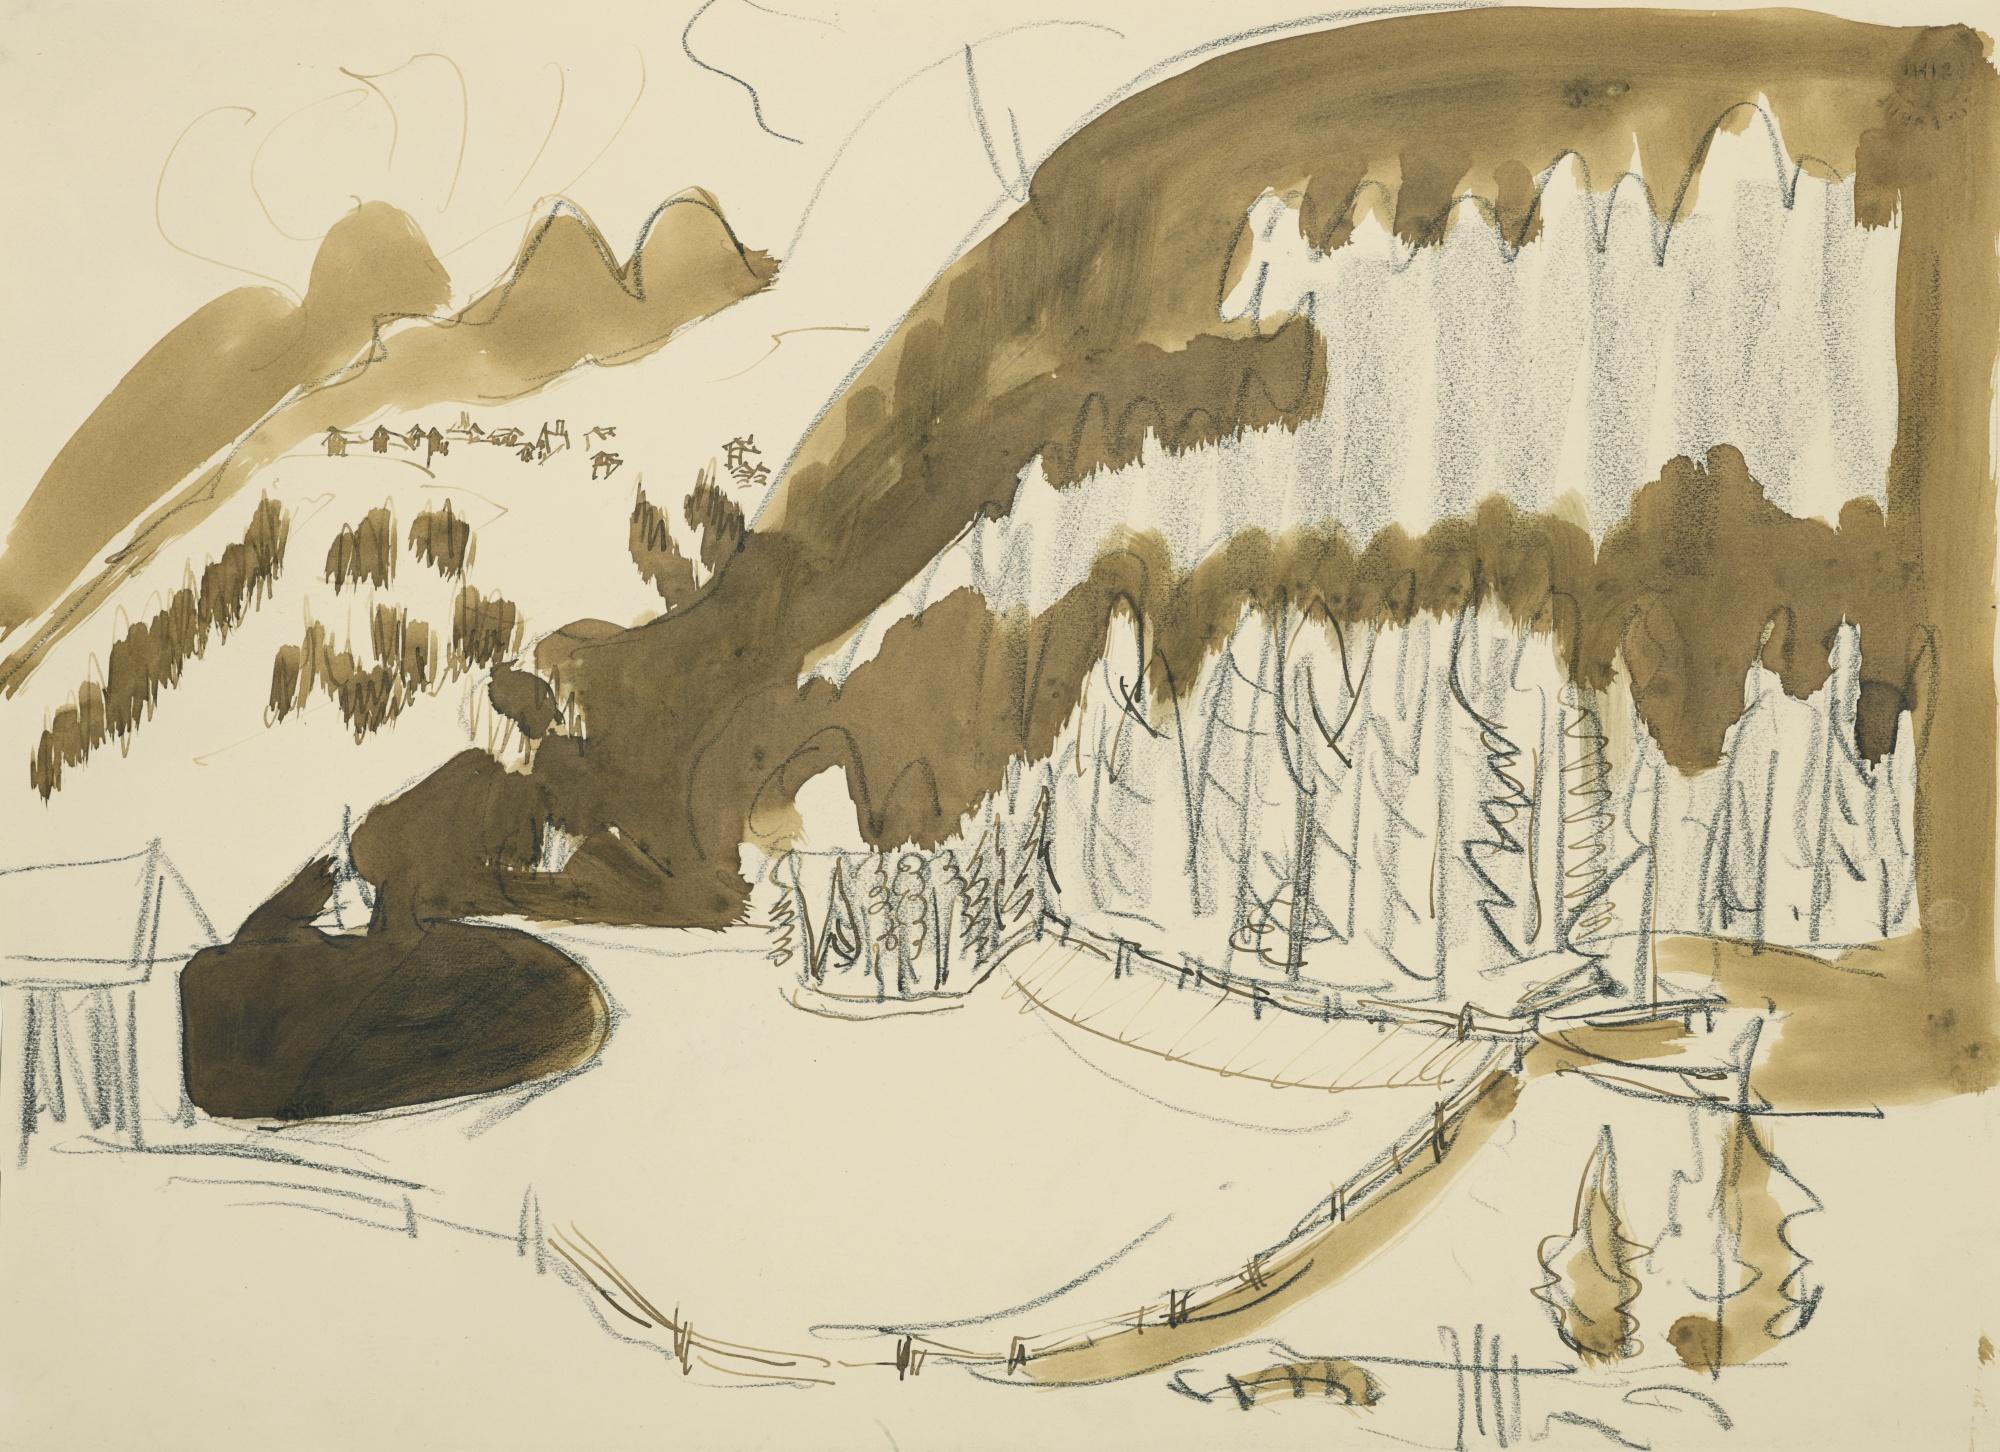 Ernst Ludwig Kirchner-Landschaft Bei Davos (Berglandschaft Im Winter, Bewaldete Berglandschaft) (Landscape Near Davos (Mountain Landscape In Winter, Forested Mountain Landscape))-1937